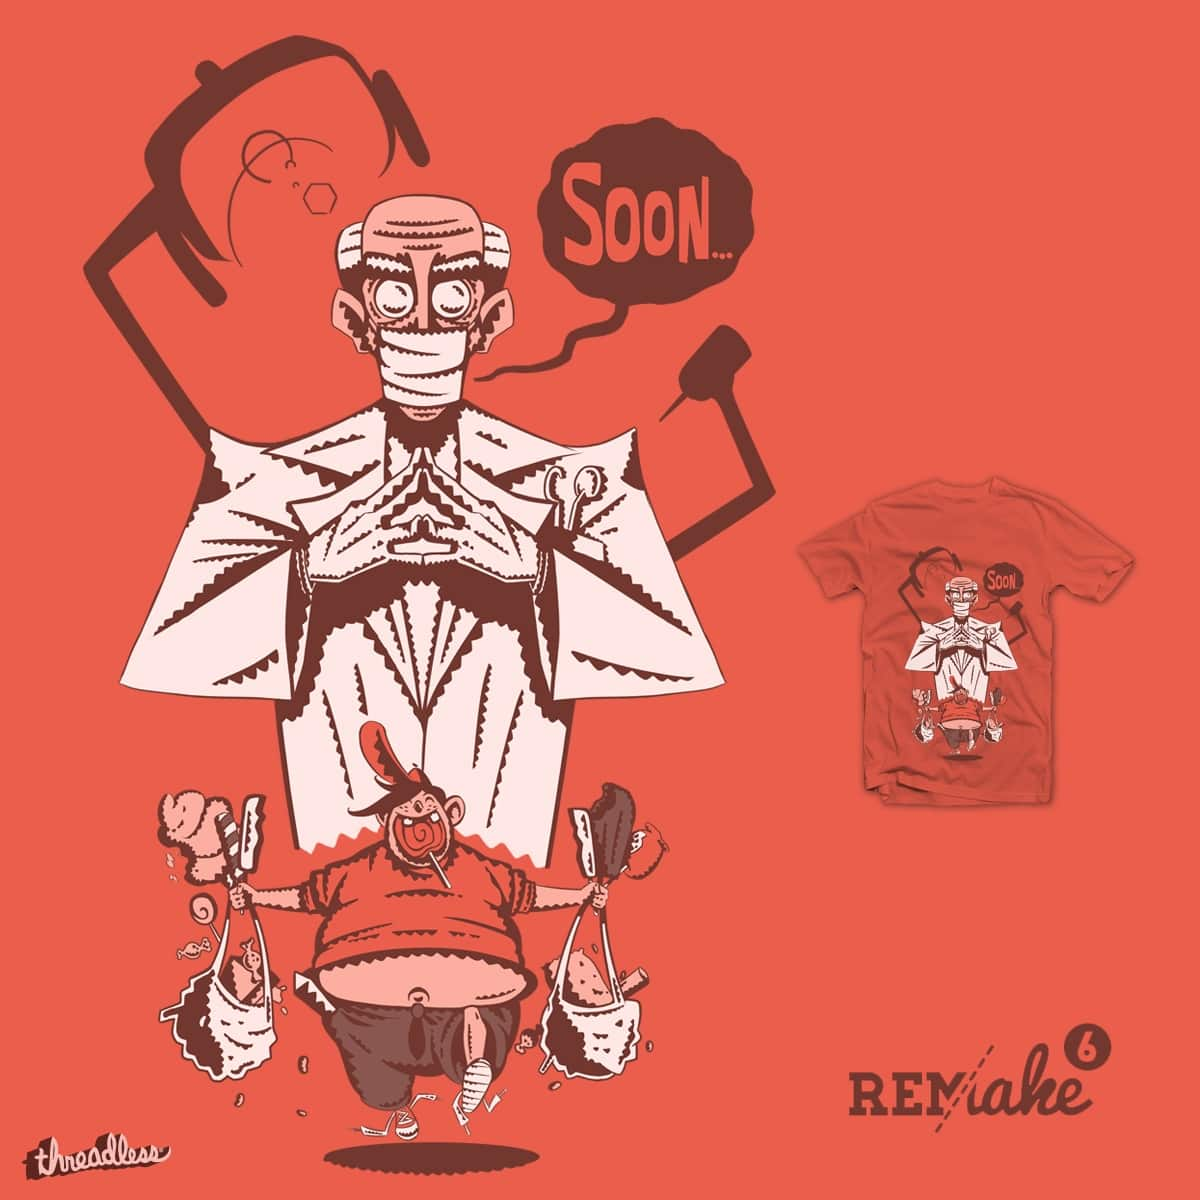 Soon... by nerrik and Kudaman on Threadless